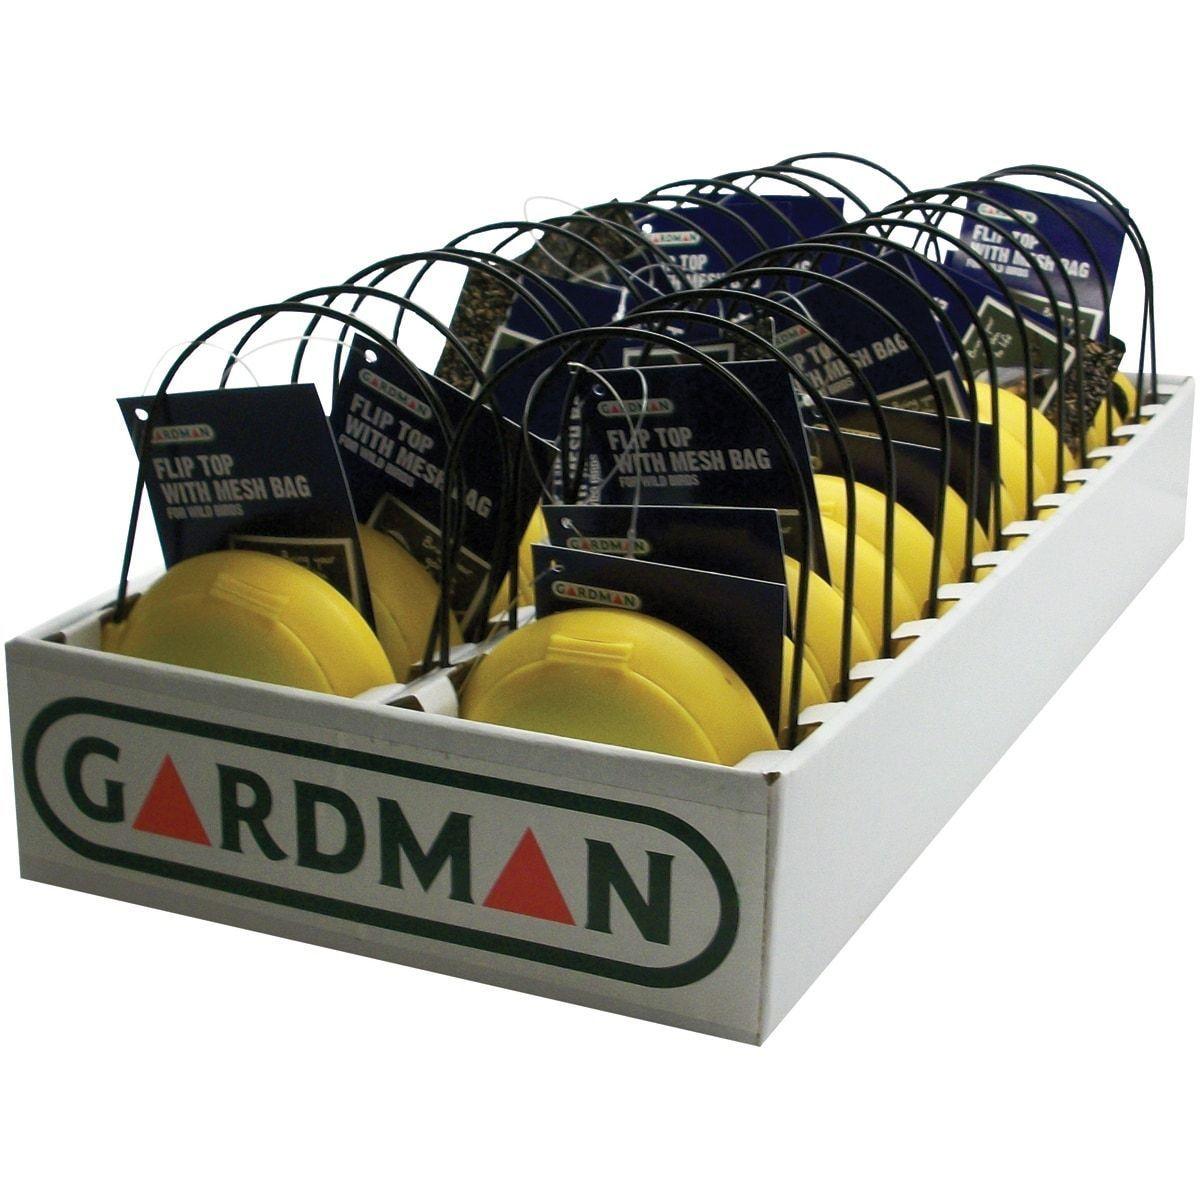 Flip Top Thistle Feeder Bag-Yellow/Black - Yellow/Black